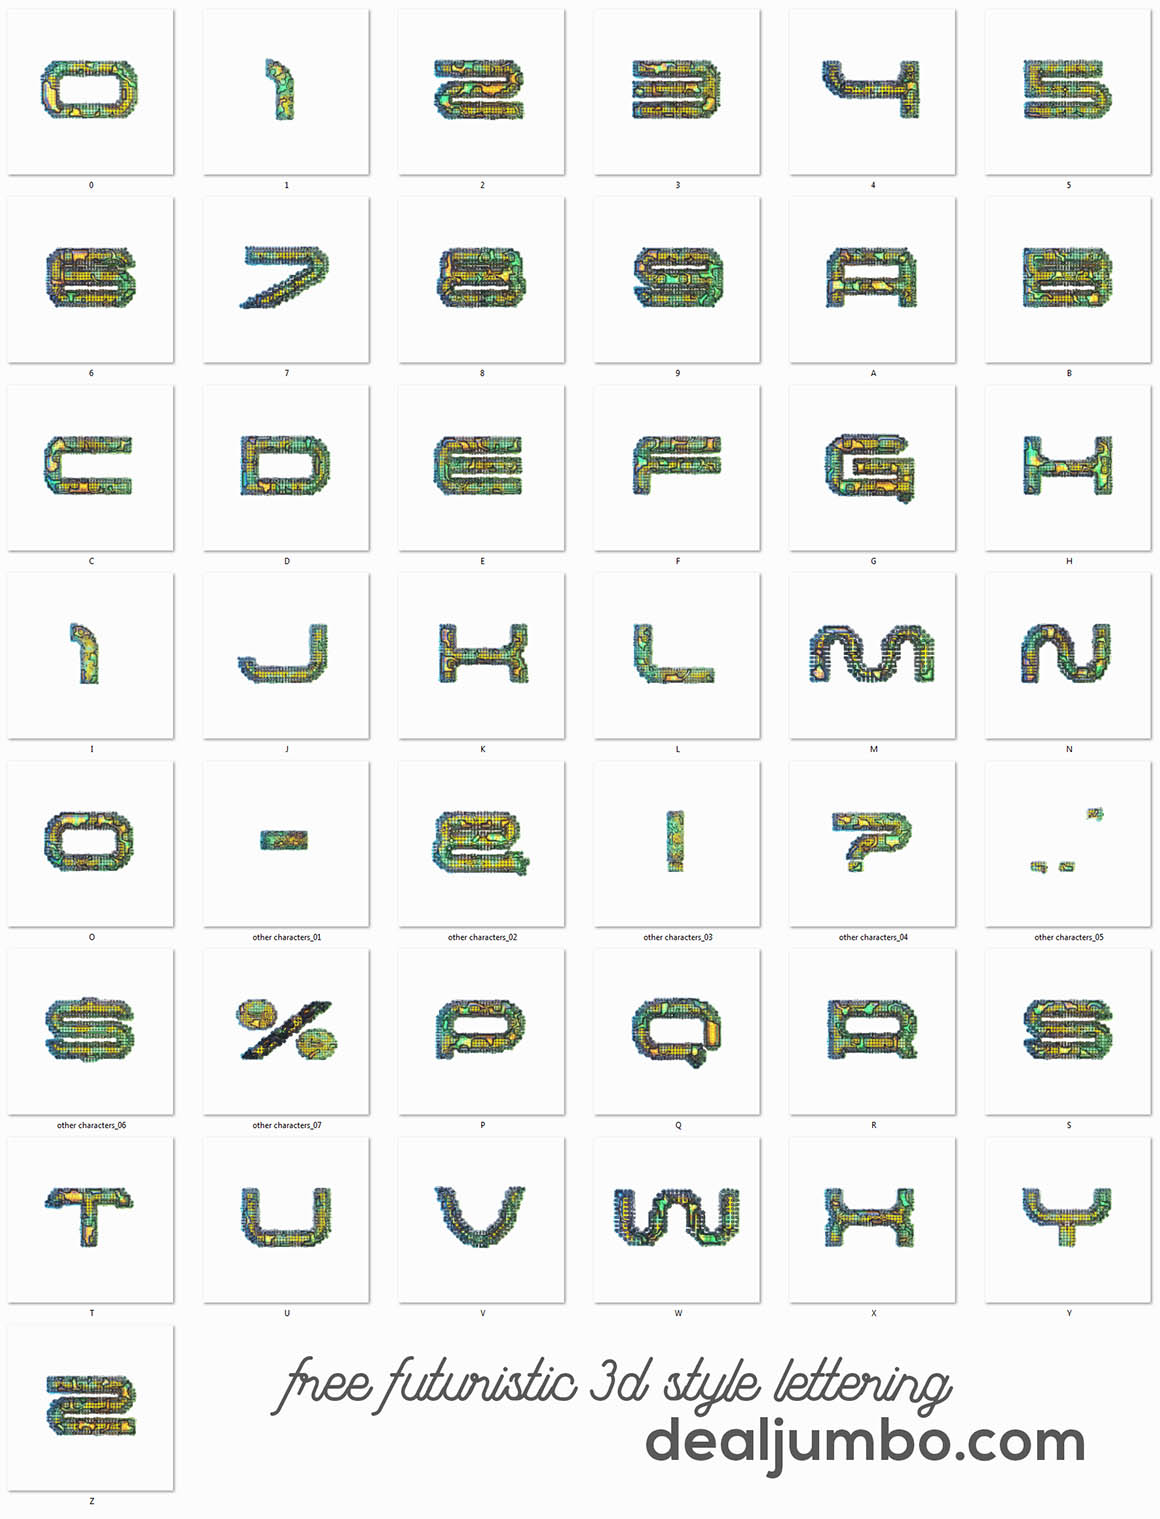 Futuristic-3D-lettering-Dealjumbo-3